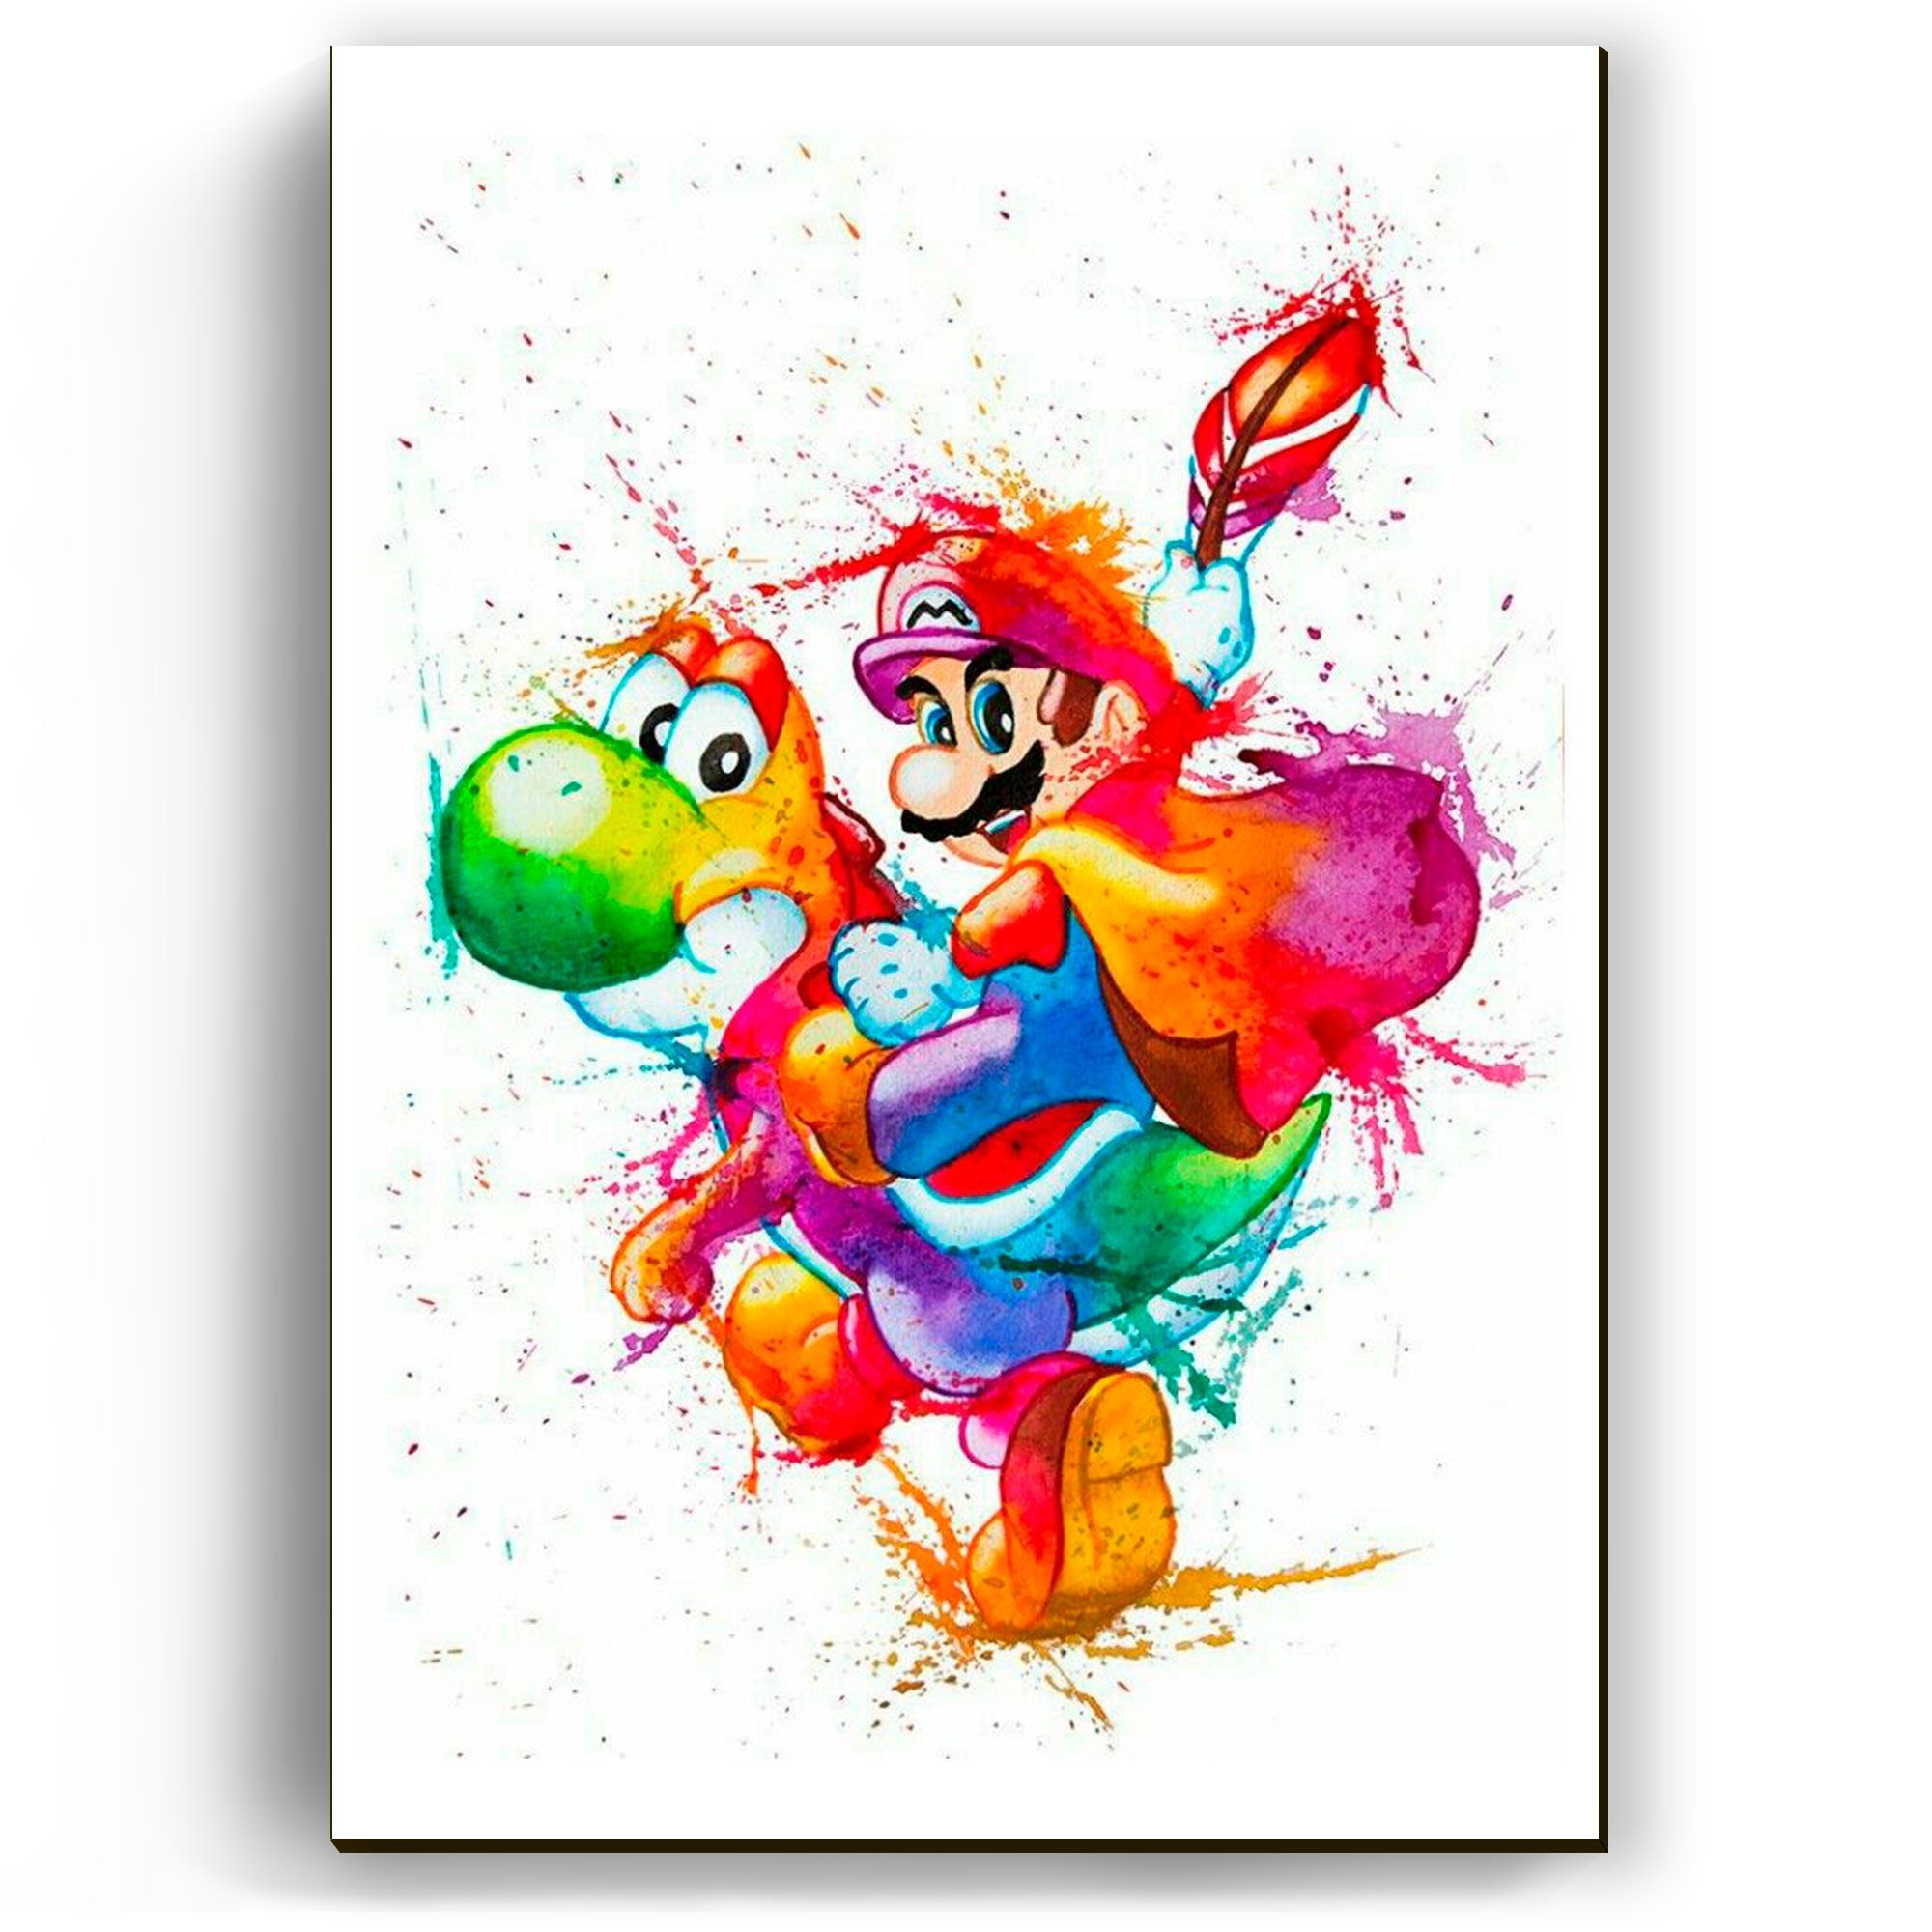 Quadro - Mario e Yoshi Splash